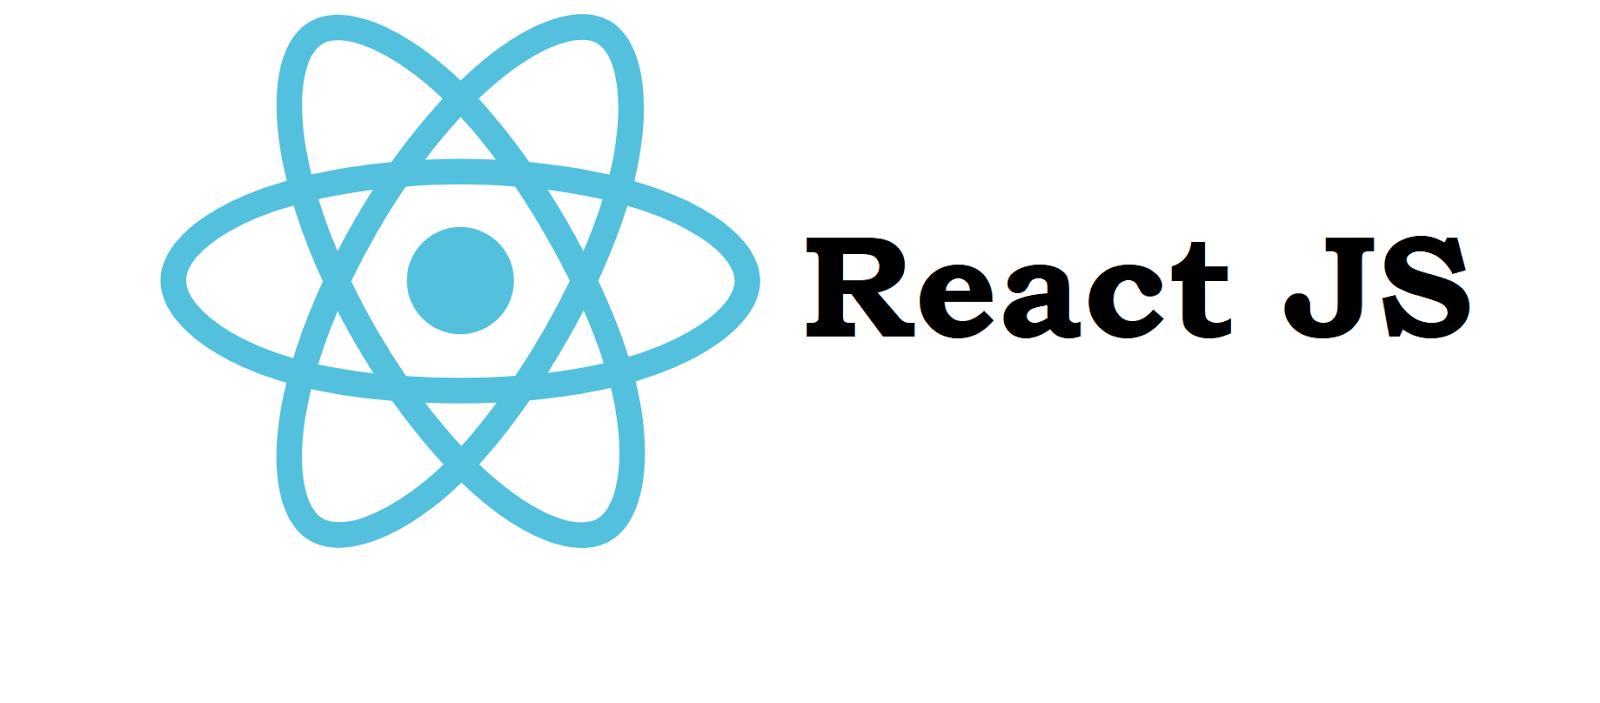 How To Hire a ReactJS Developer